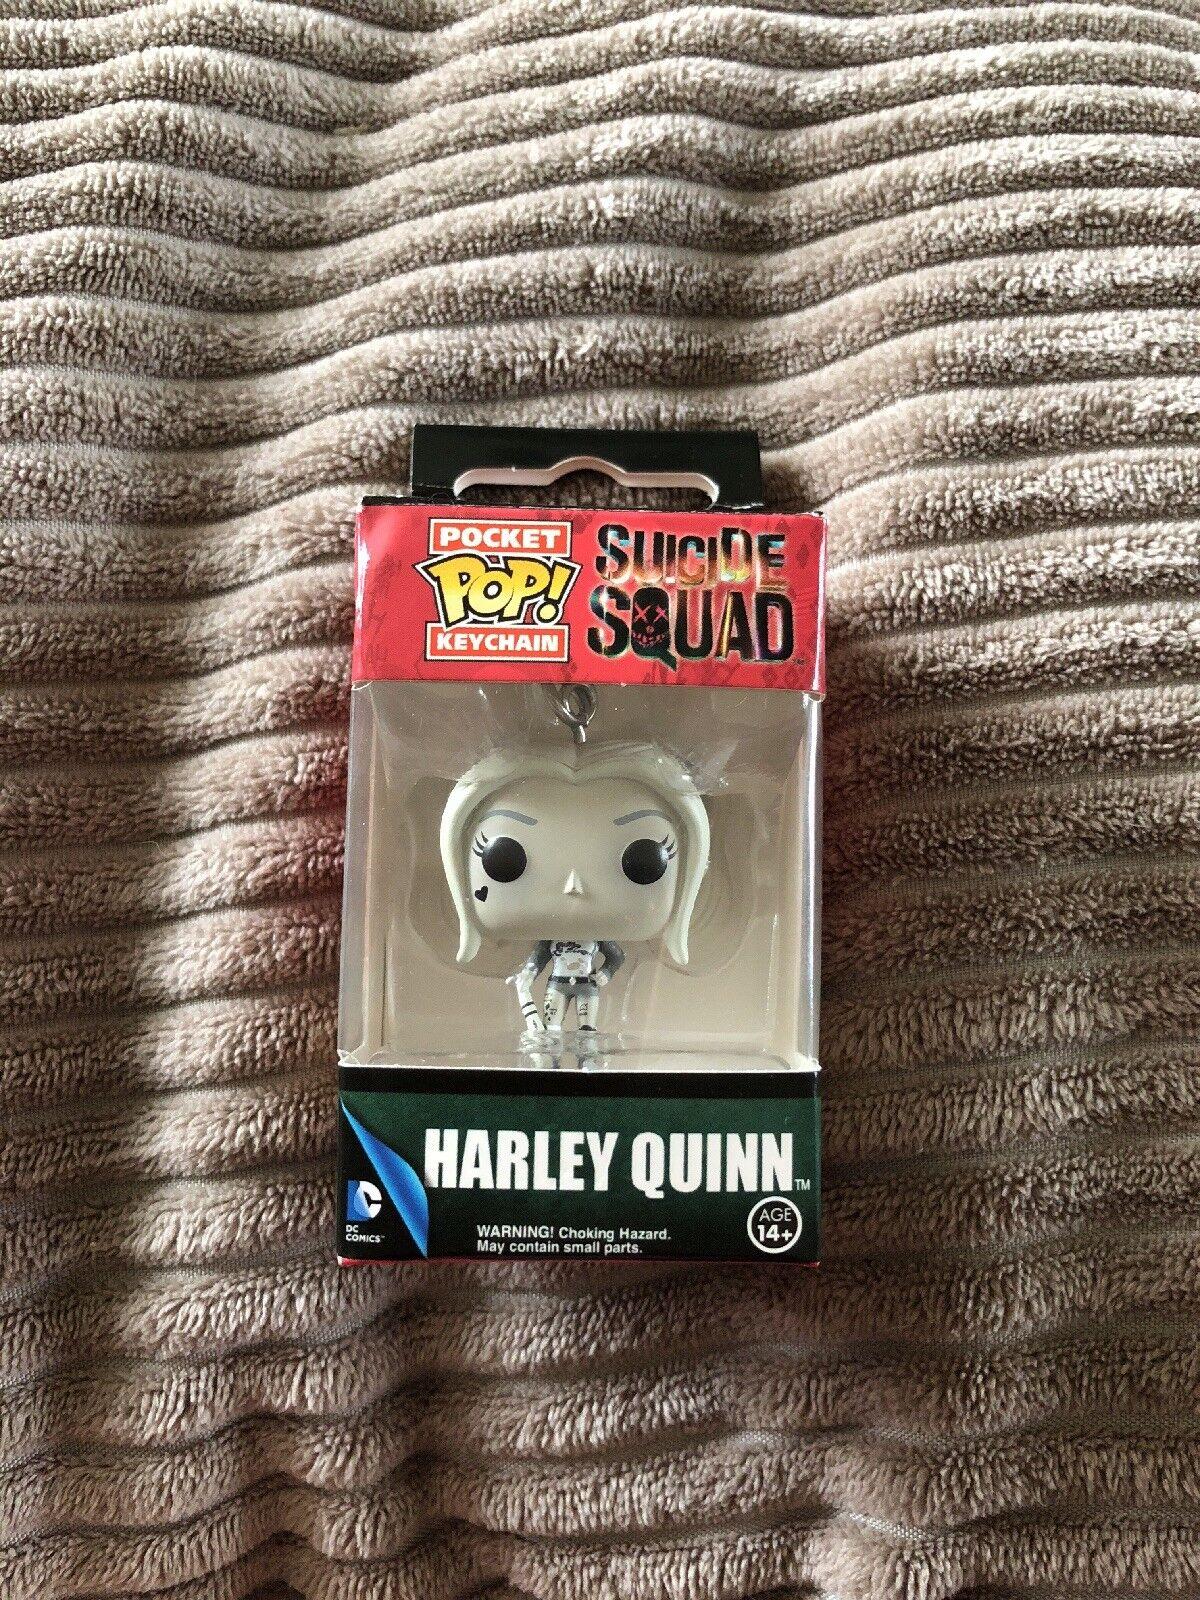 Funko Pop Vinyl Harley Quinn Suicide Squad  Very Rare Keychain Nerd Block.